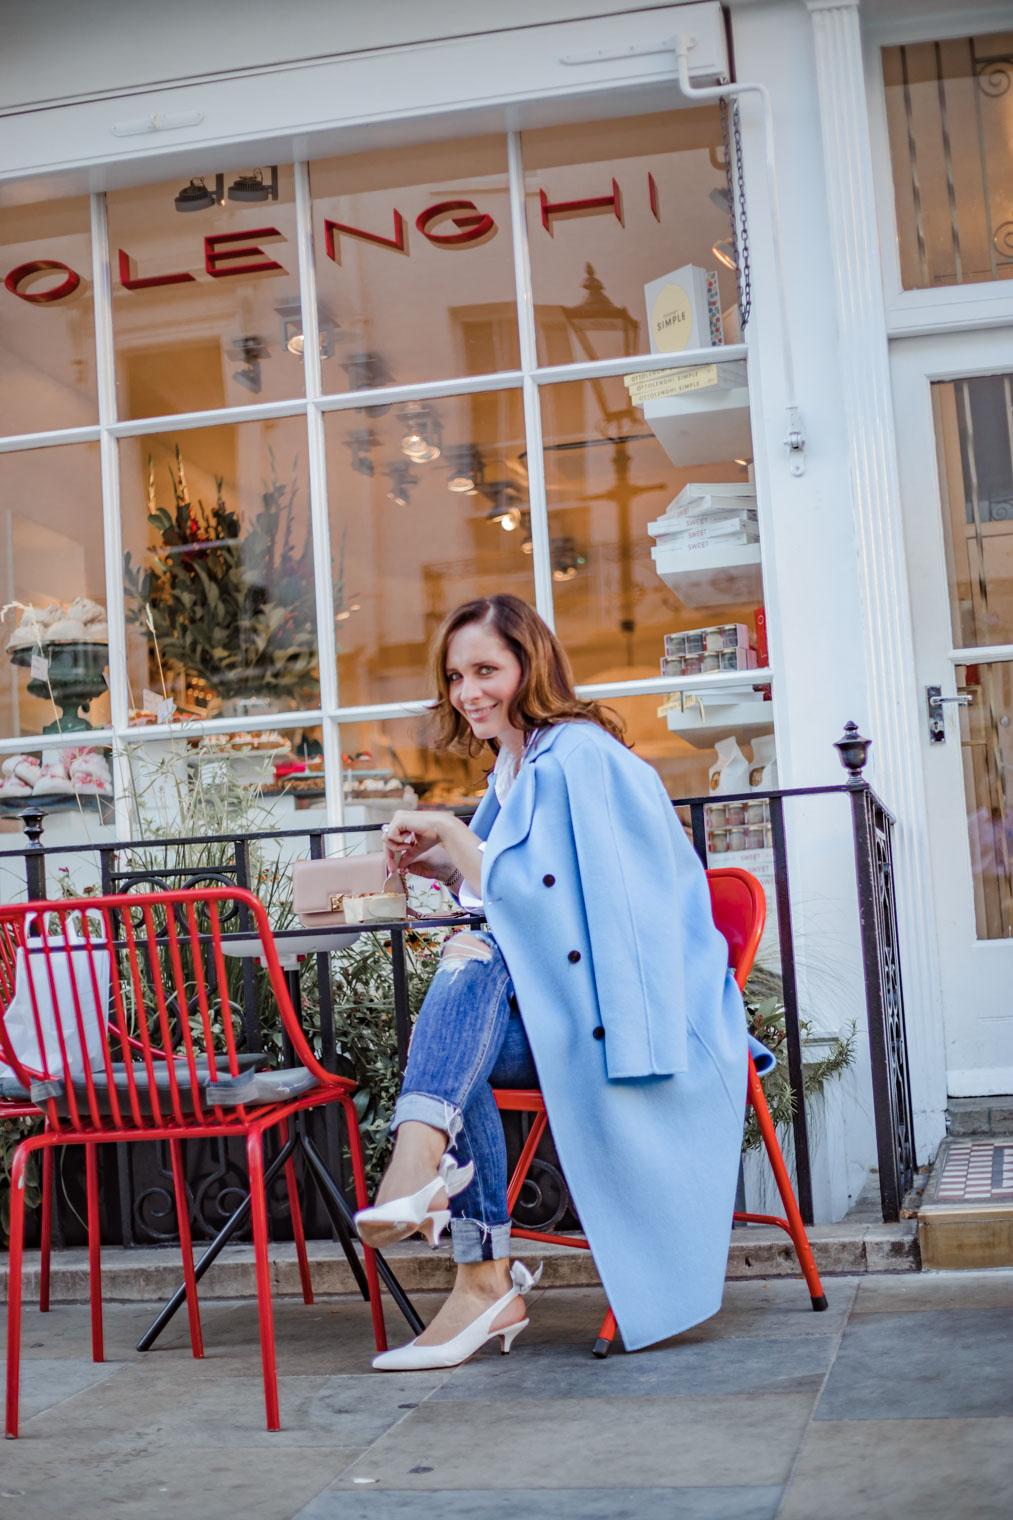 Tips on eating on the go Ottolenghi Knighstbridge London